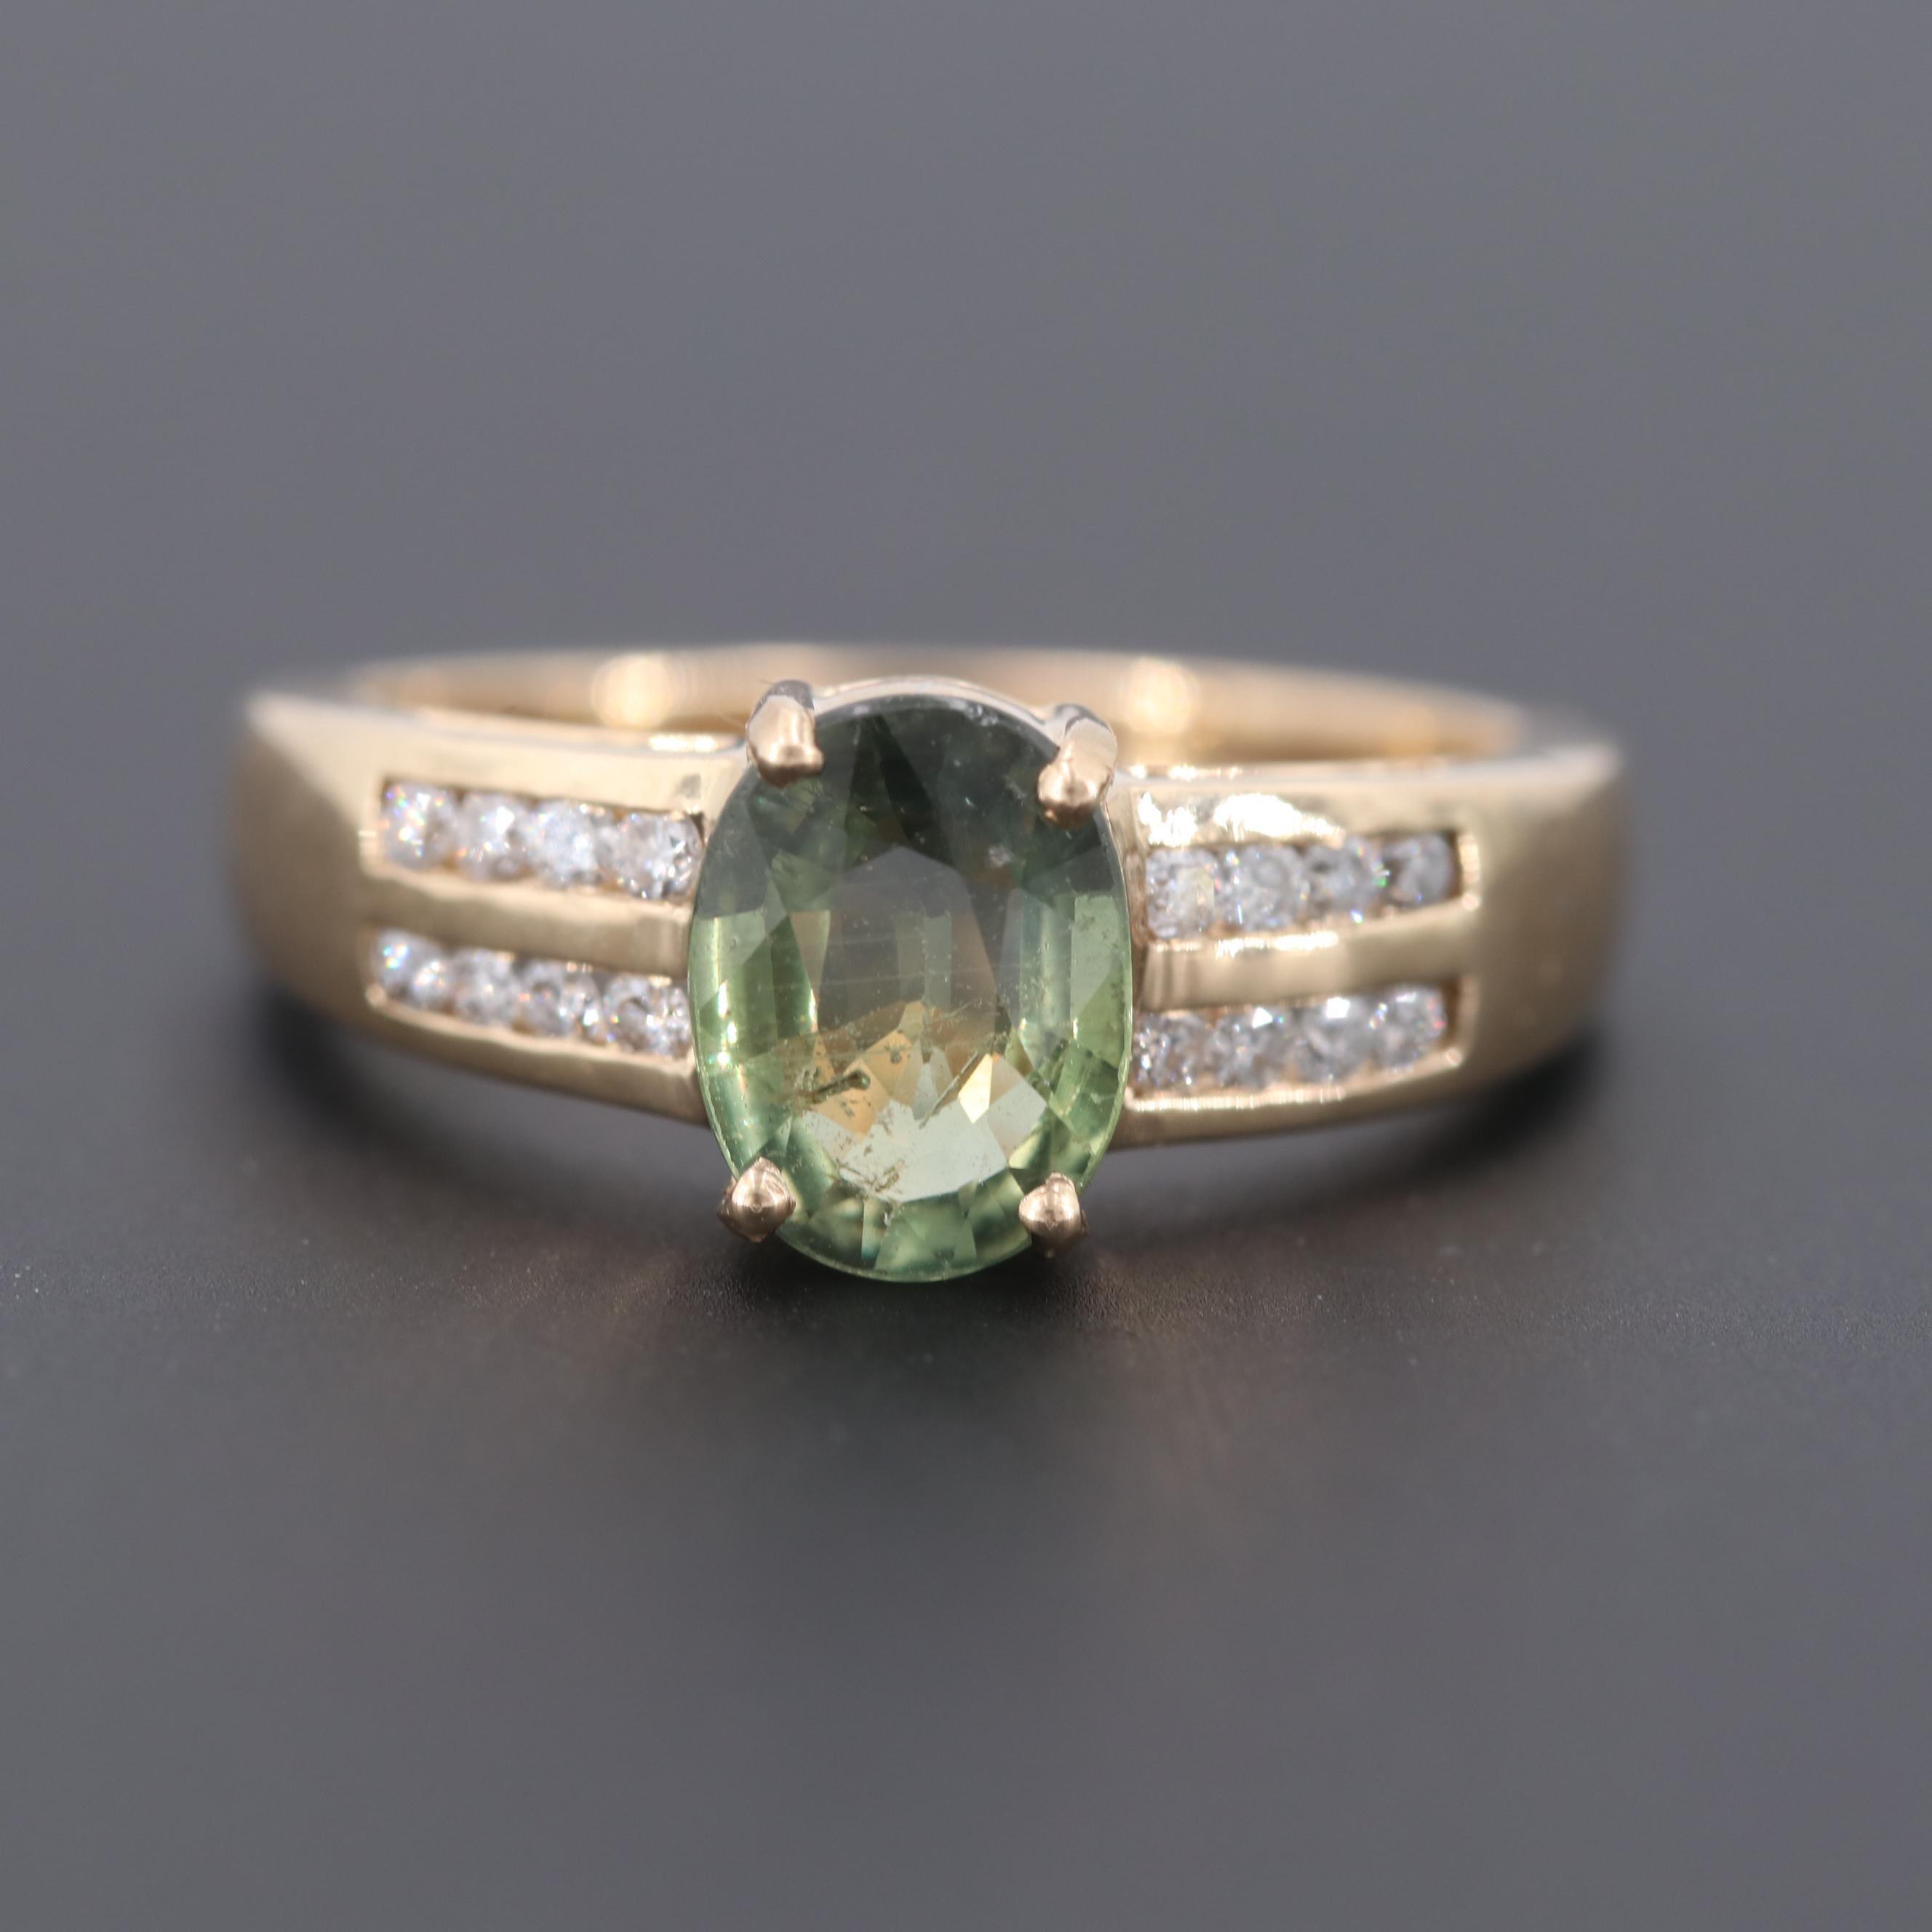 14K Yellow Gold 1.16 CT Green Sapphire and Diamond Ring